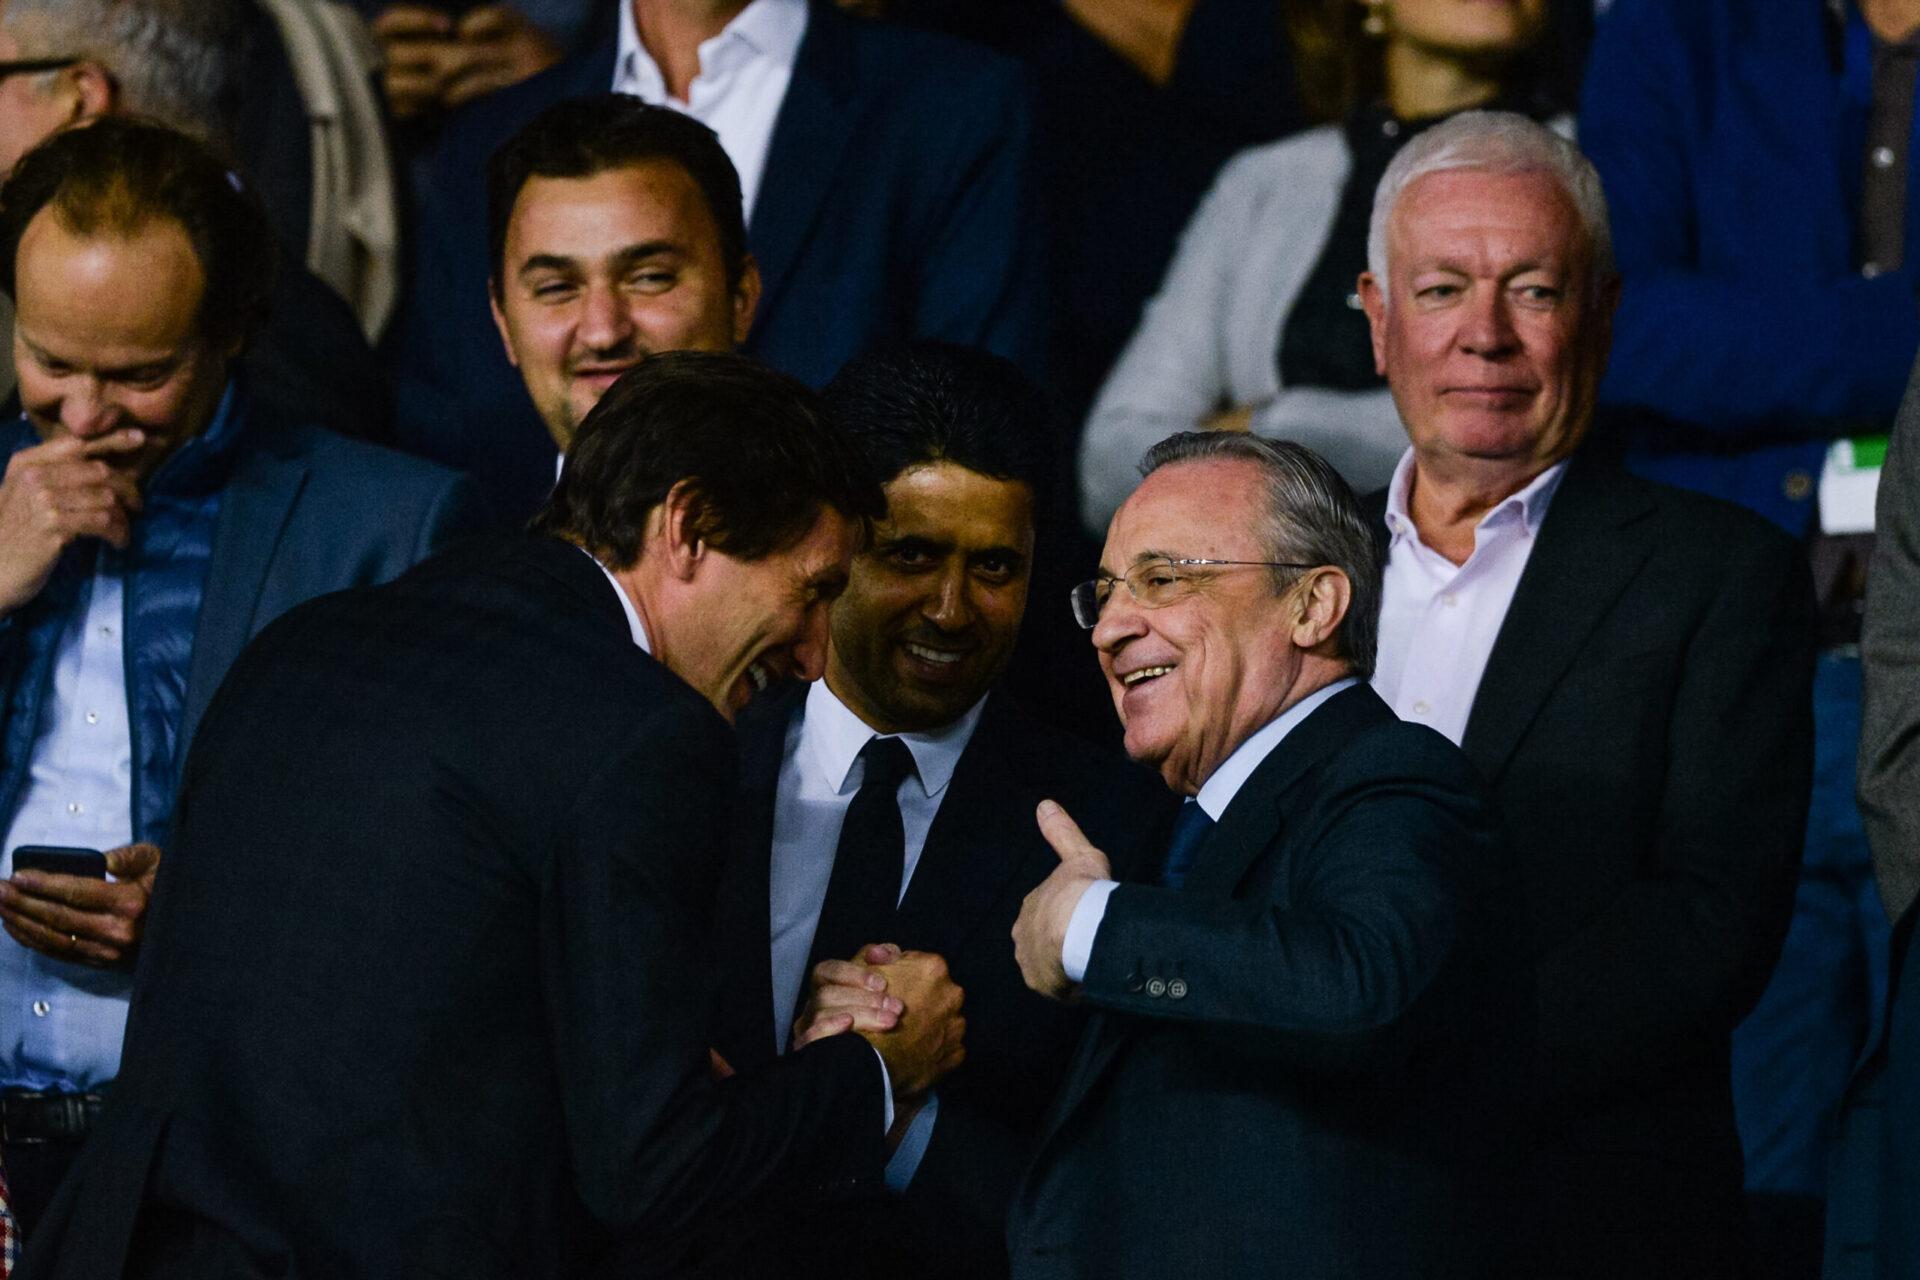 Leonardo et Florentino Perez ne seront plus bons amis (iconsport)